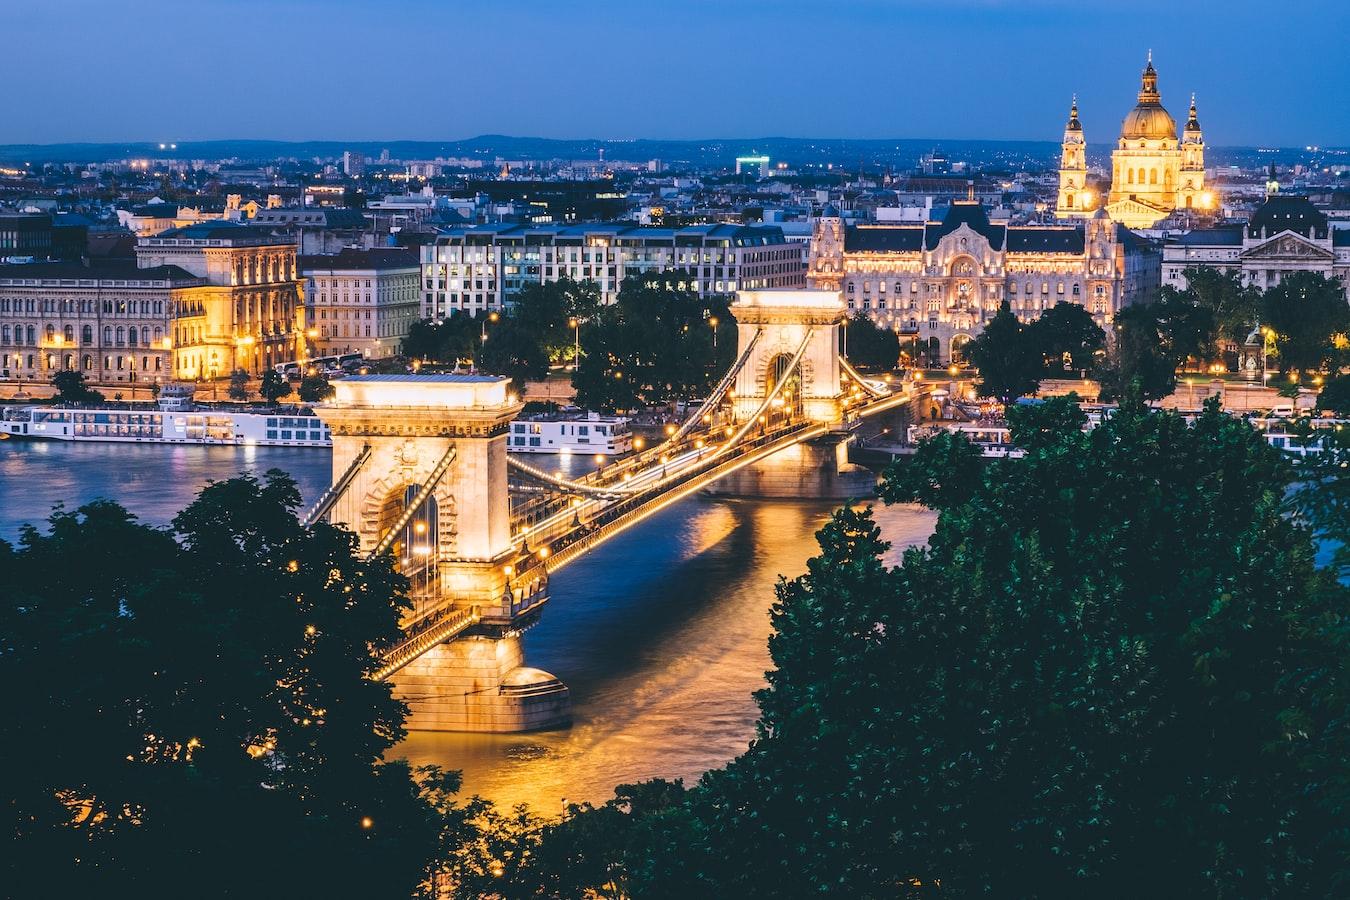 v dubnu na dovolenou na výlet do maďarska budapešť